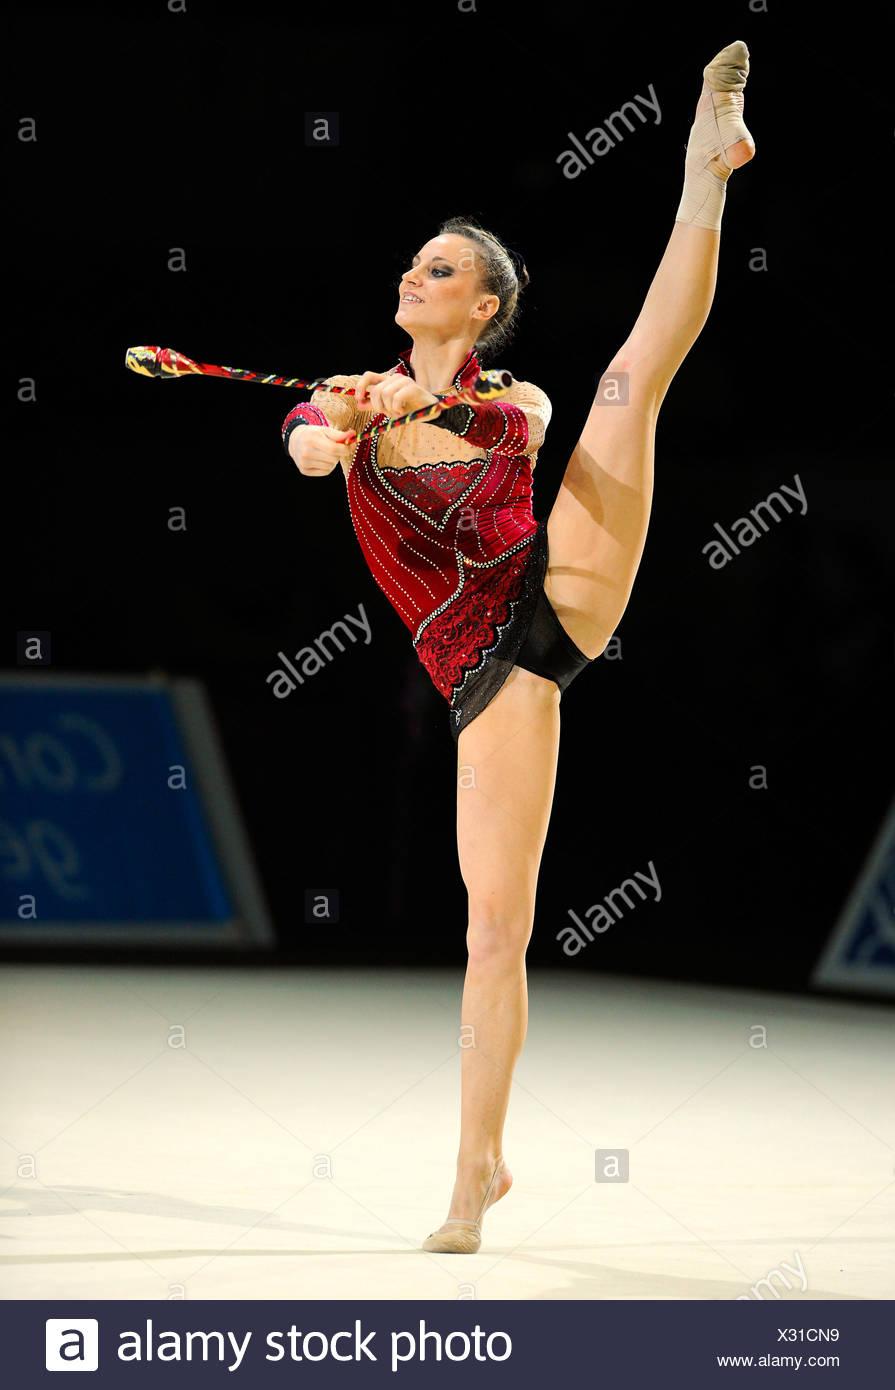 RSG, rhythmic gymnastics, gymnast Delphine LEDOUX, France - Stock Image